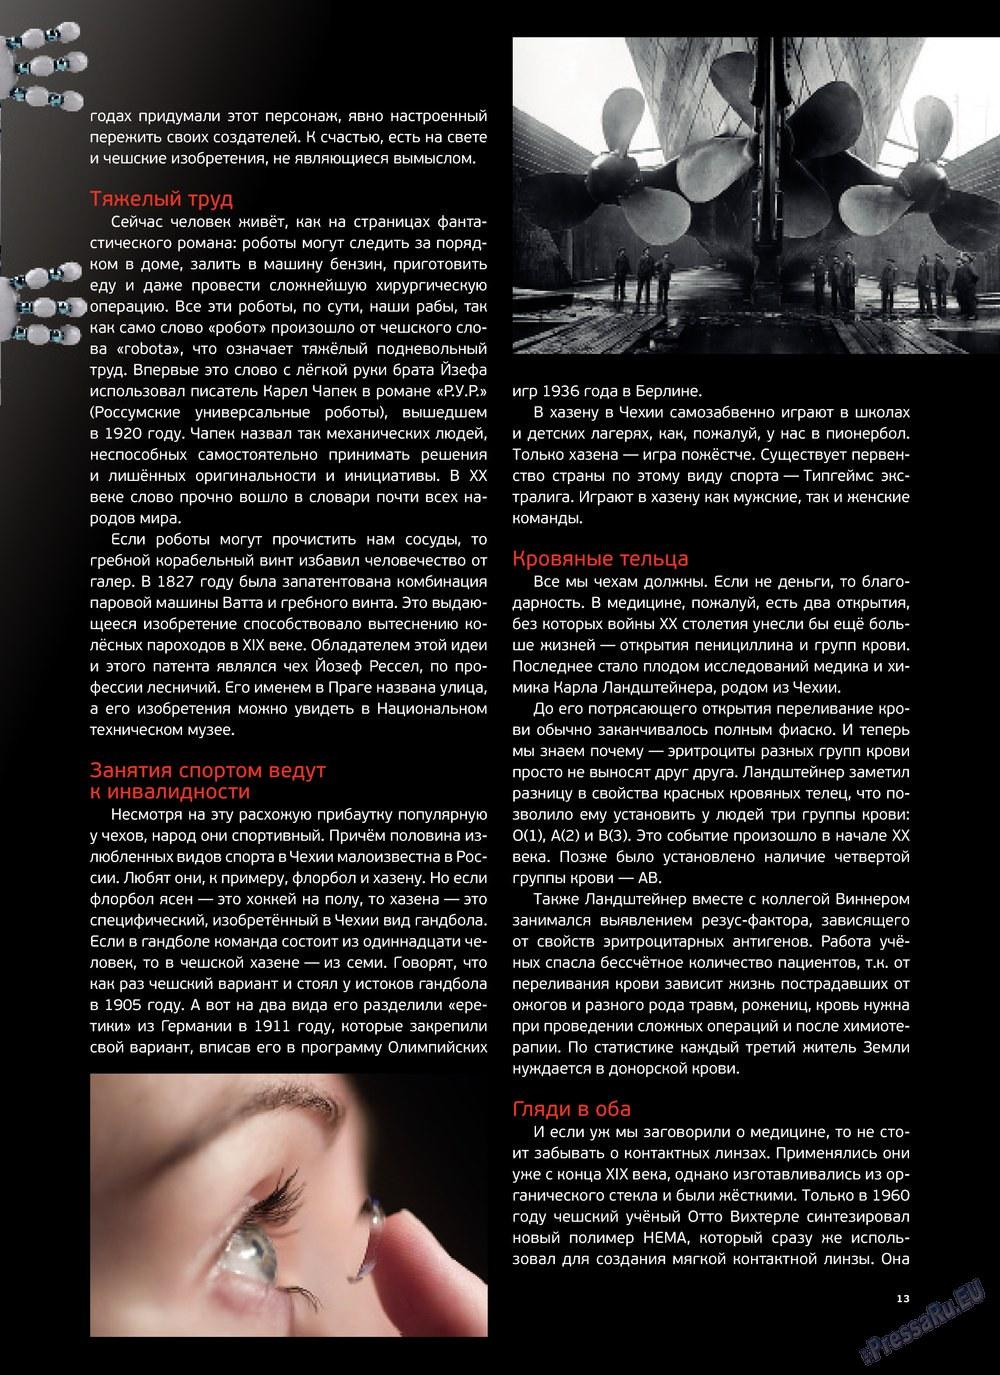 Артек (журнал). 2013 год, номер 1, стр. 15